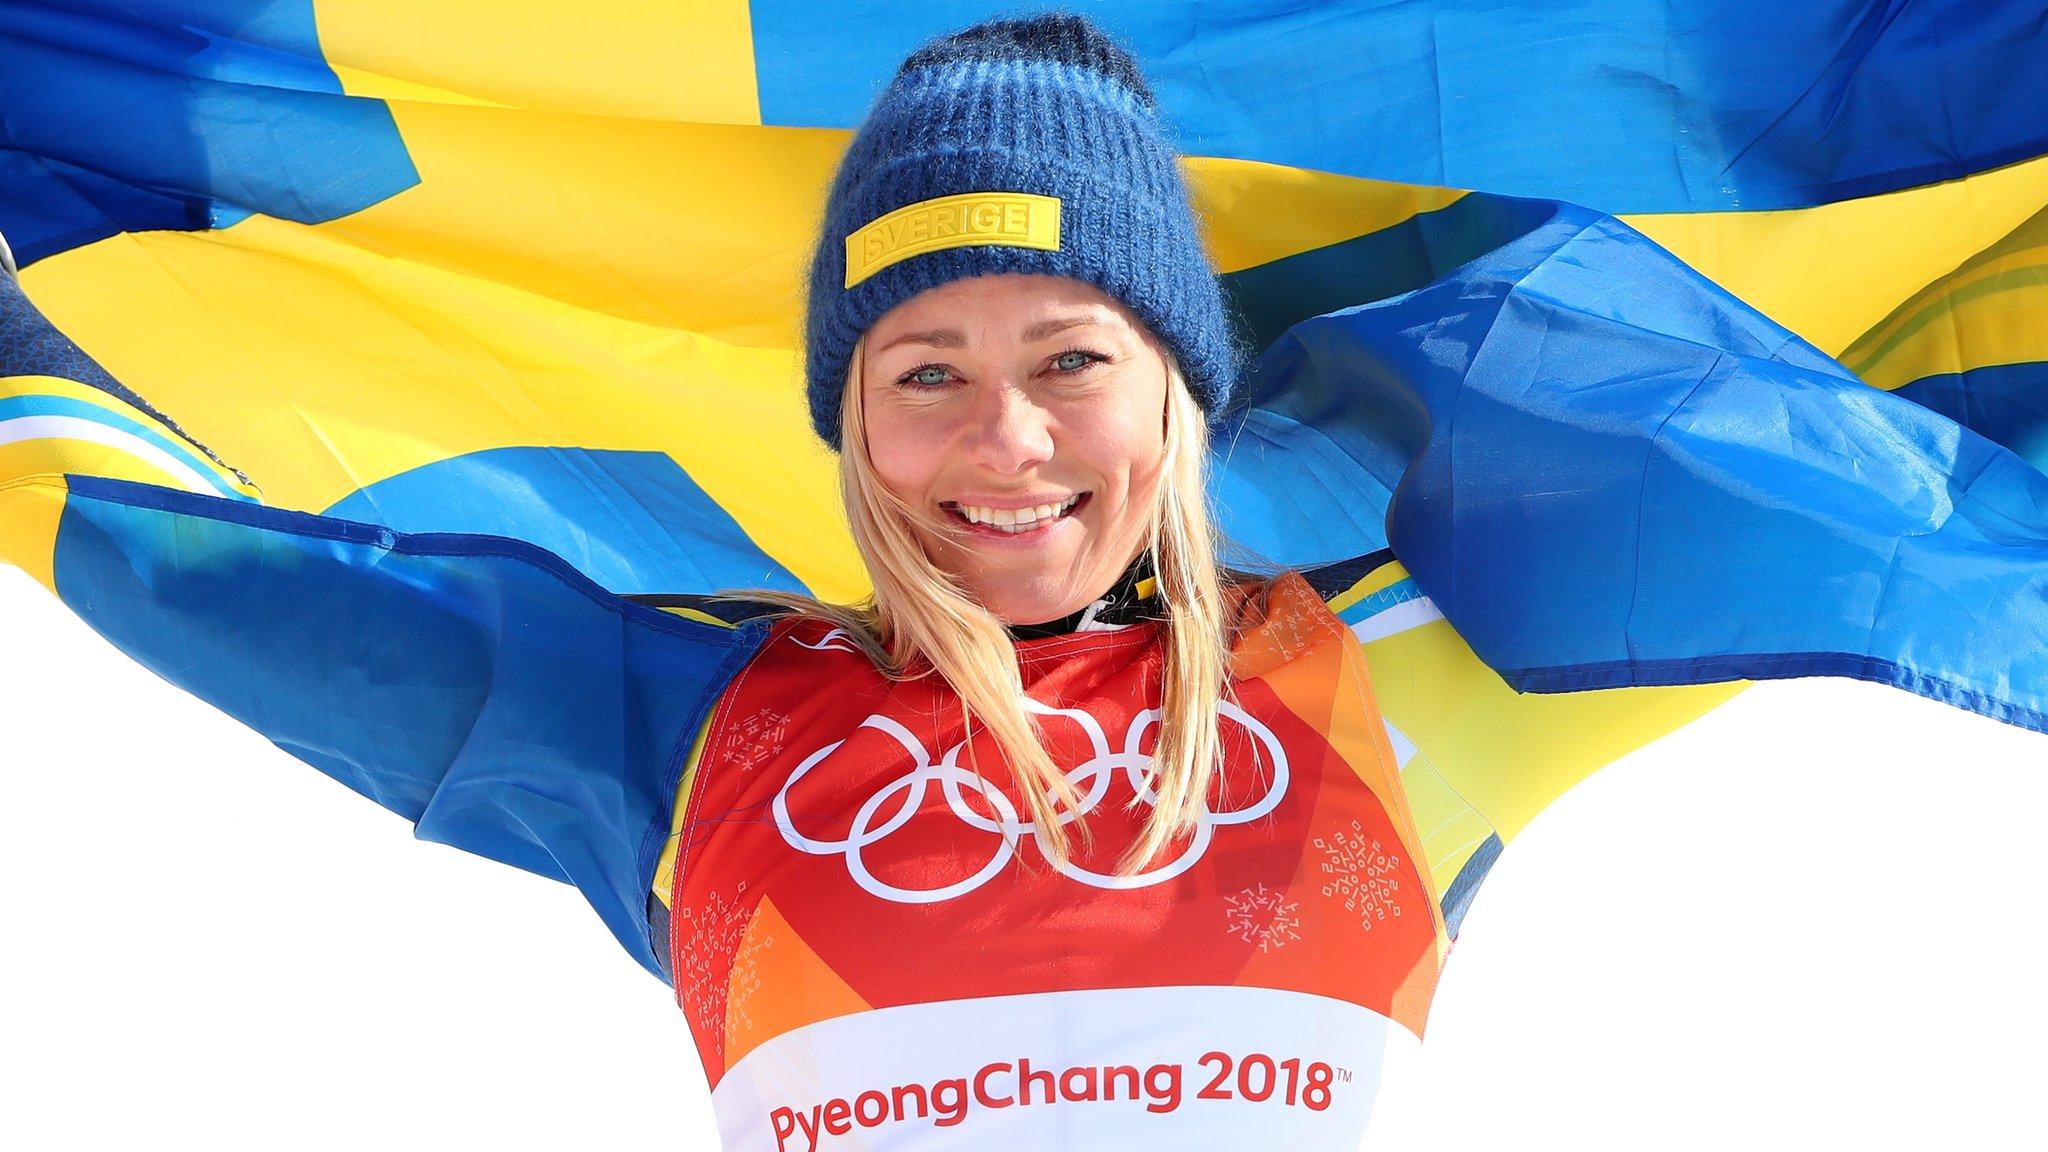 Winter Olympics: Mikaela Shiffrin fourth in slalom as Frida Hansdotter wins